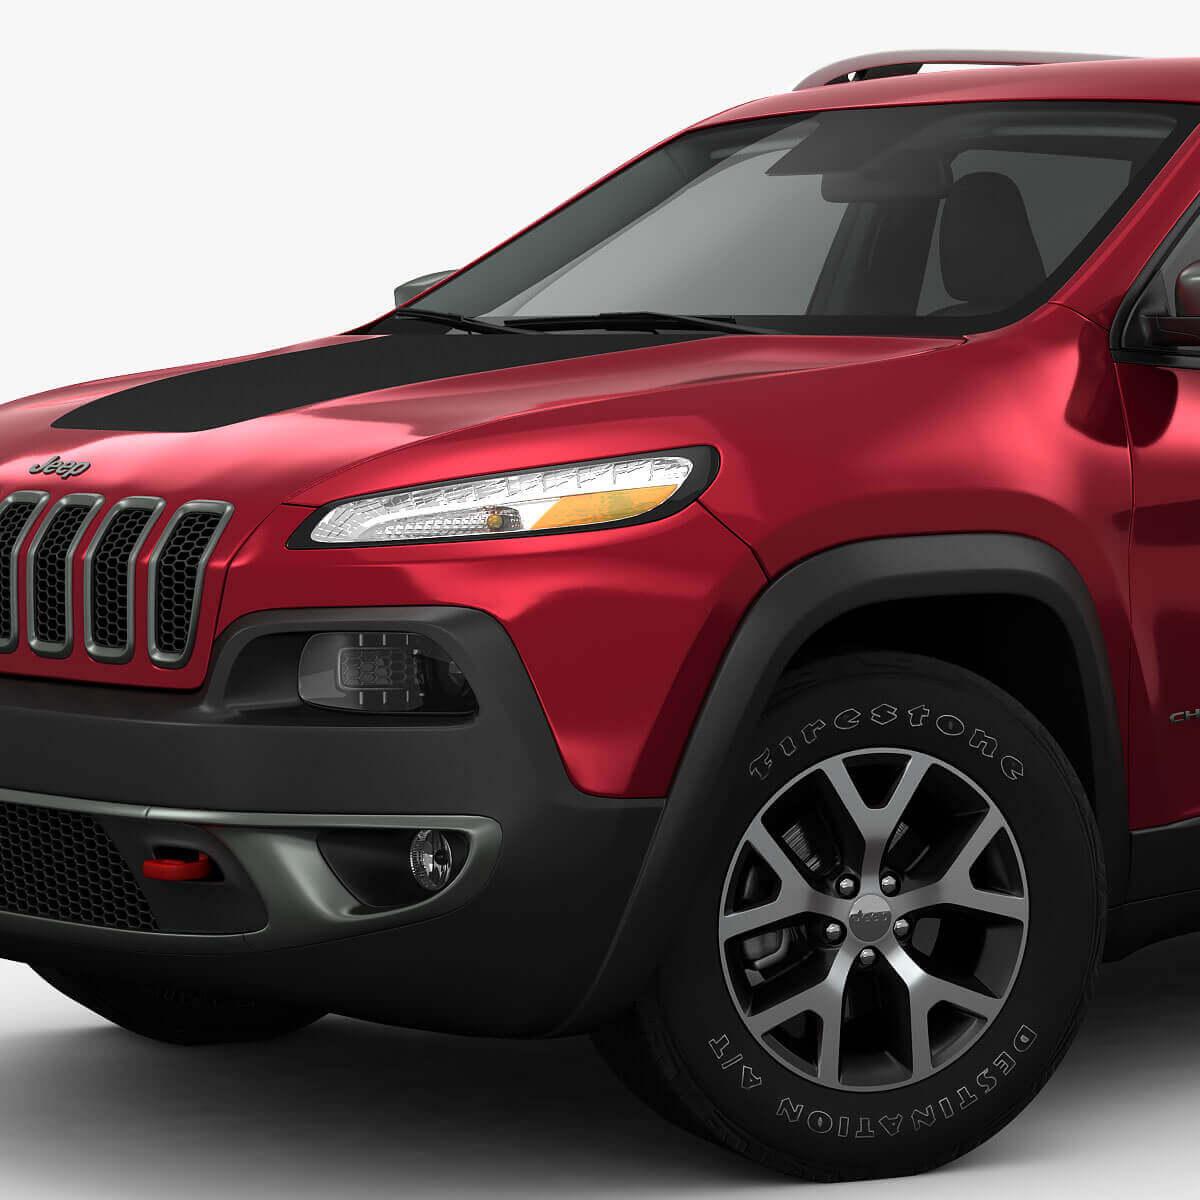 2014 jeep cherokee trailhawk 3d model. Black Bedroom Furniture Sets. Home Design Ideas